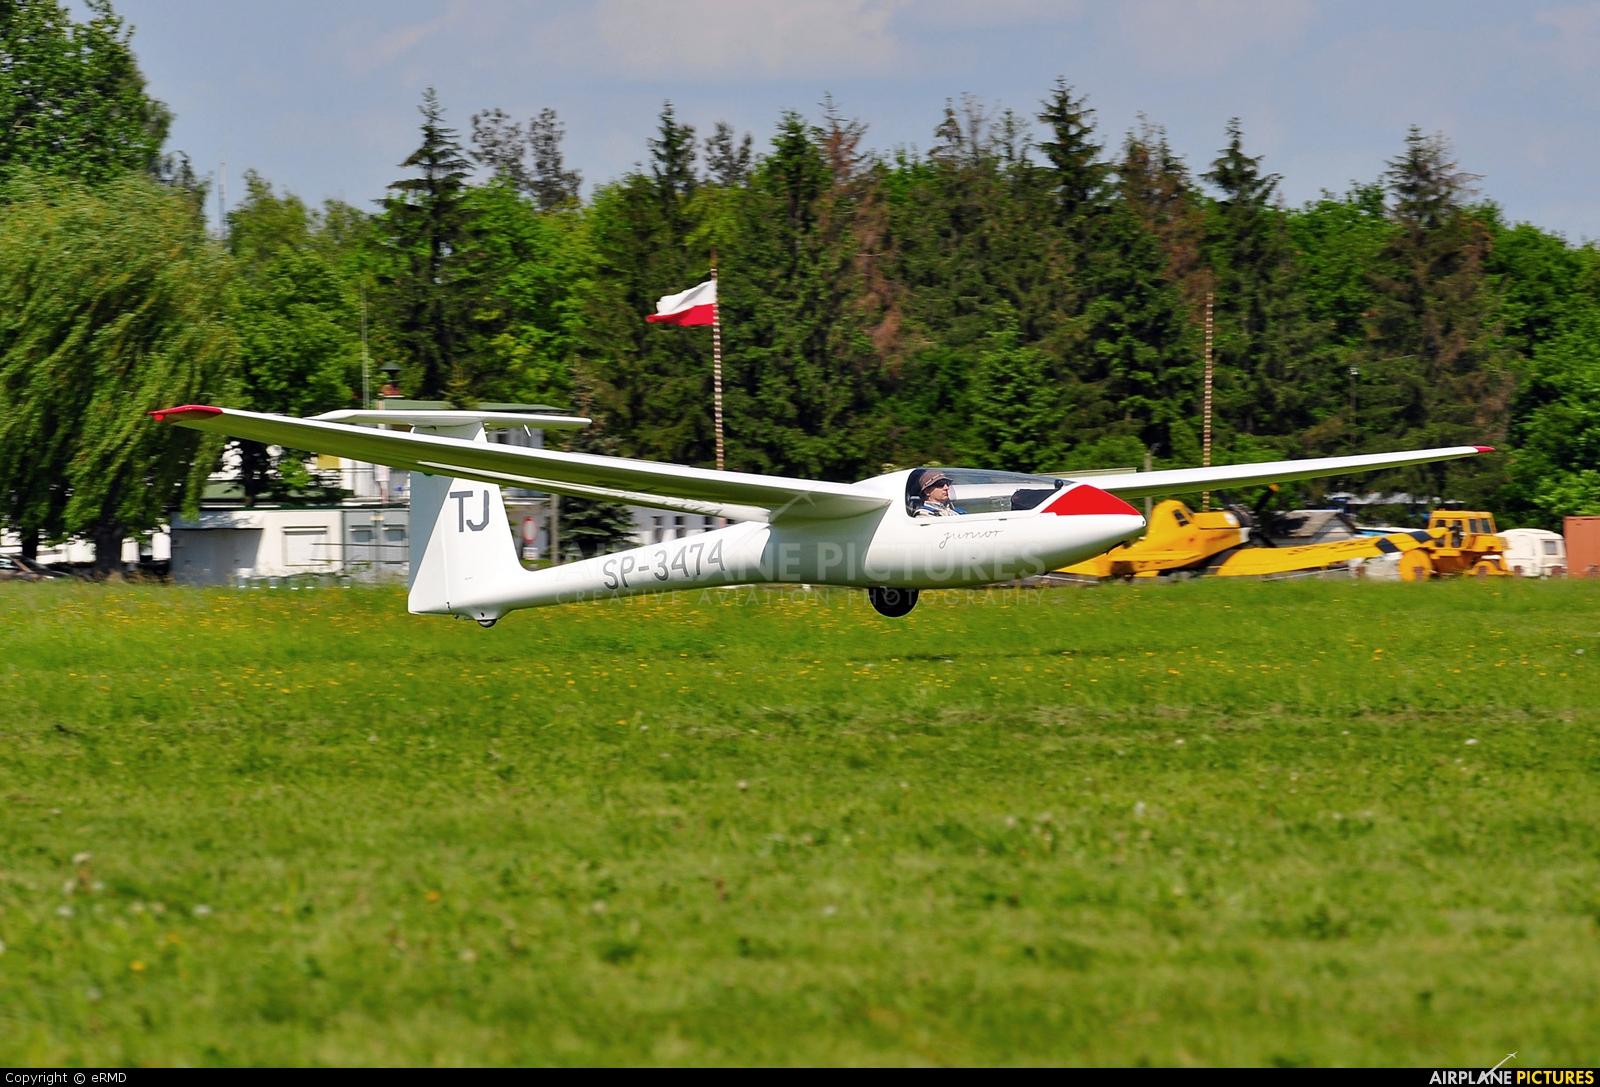 Aeroklub Radomski SP-3474 aircraft at Radom - Piastów